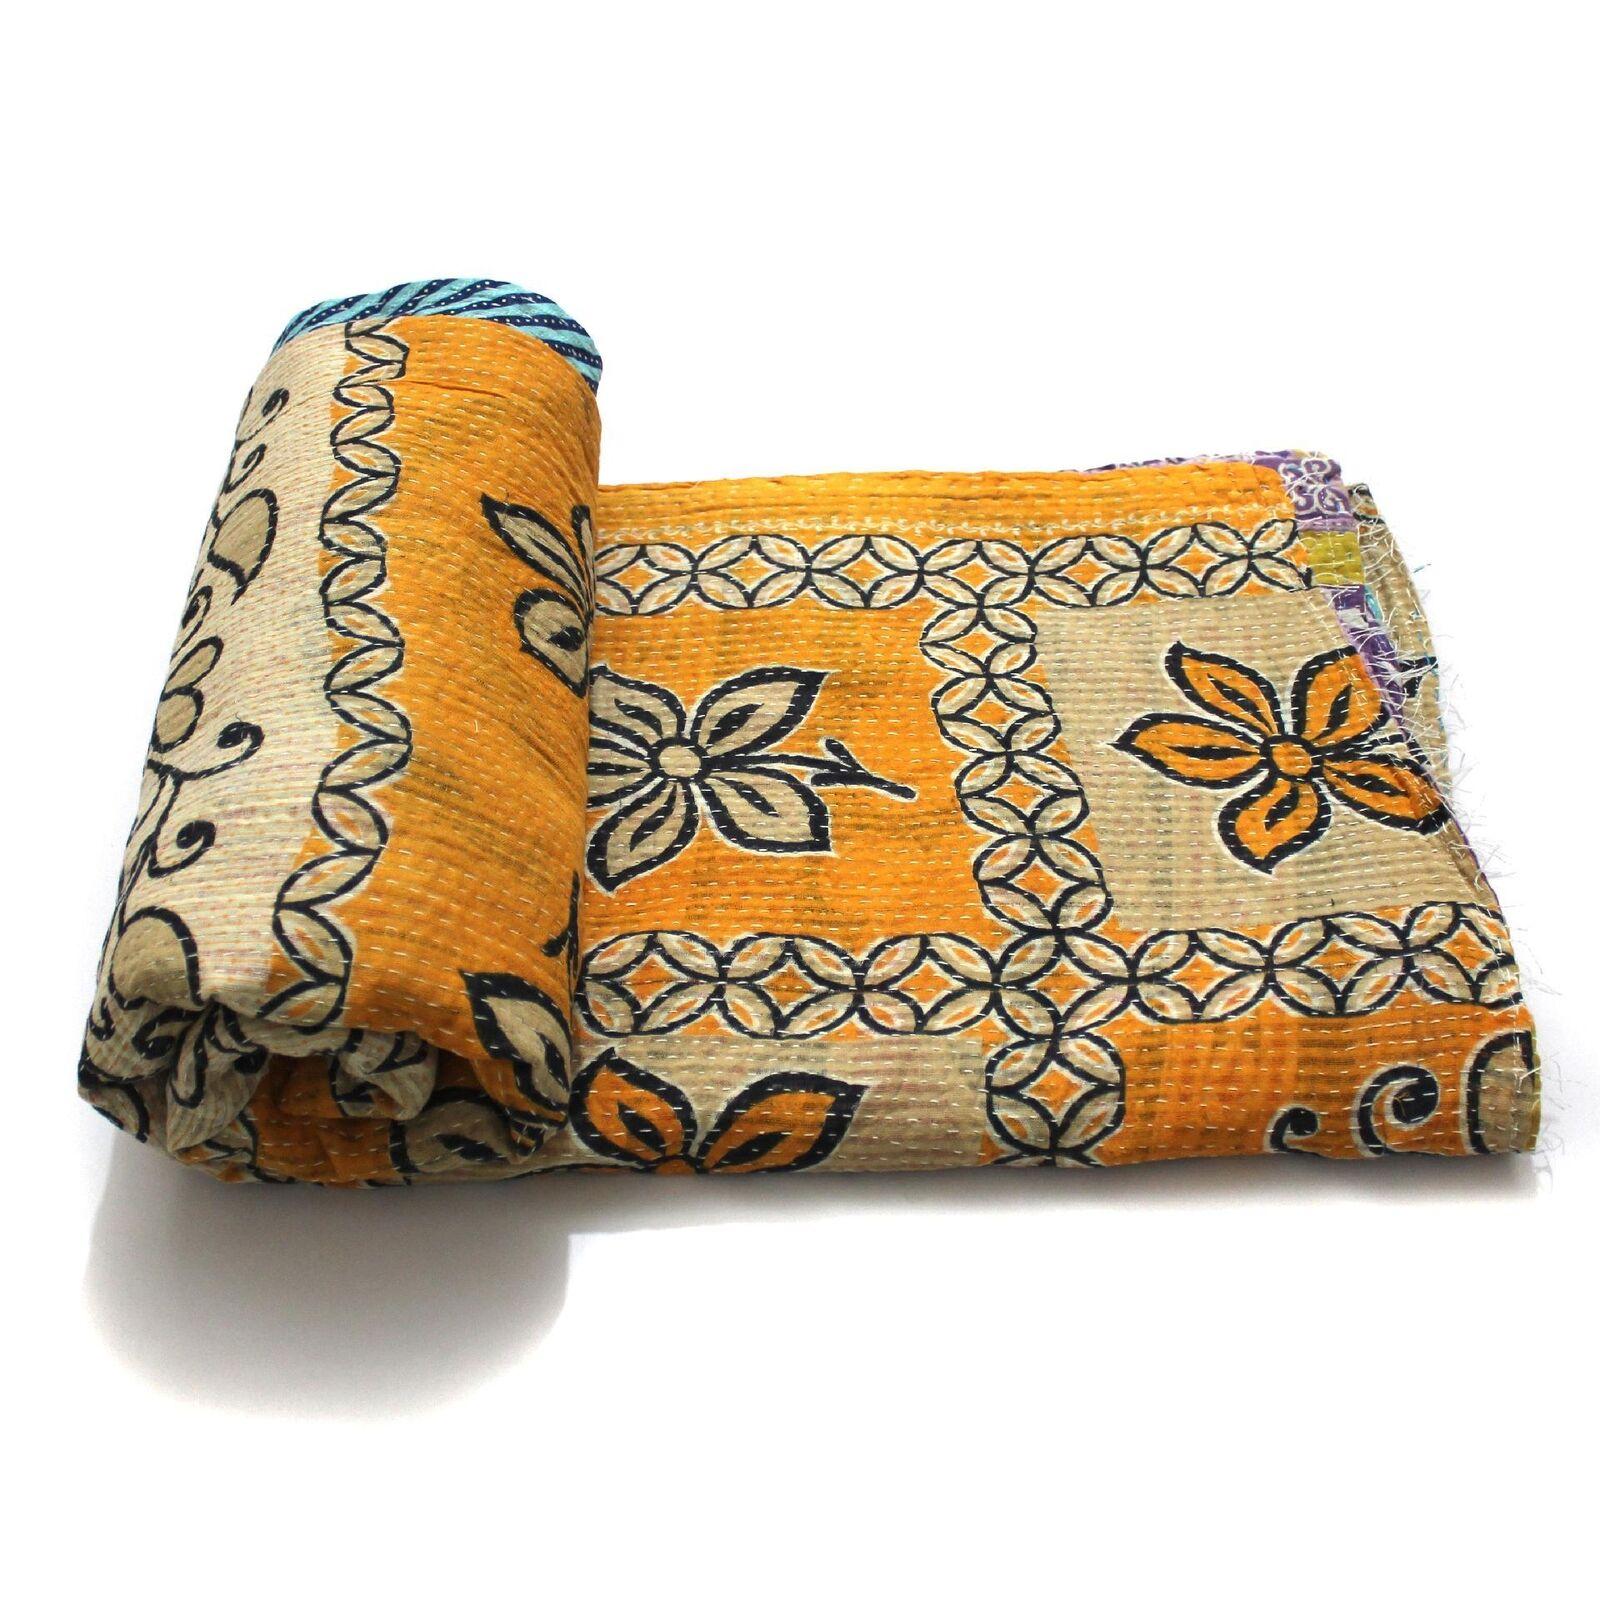 Vintage Kantha Quilt Indian Handmade Cotton Bedspread Saree Throw Bedding Cover